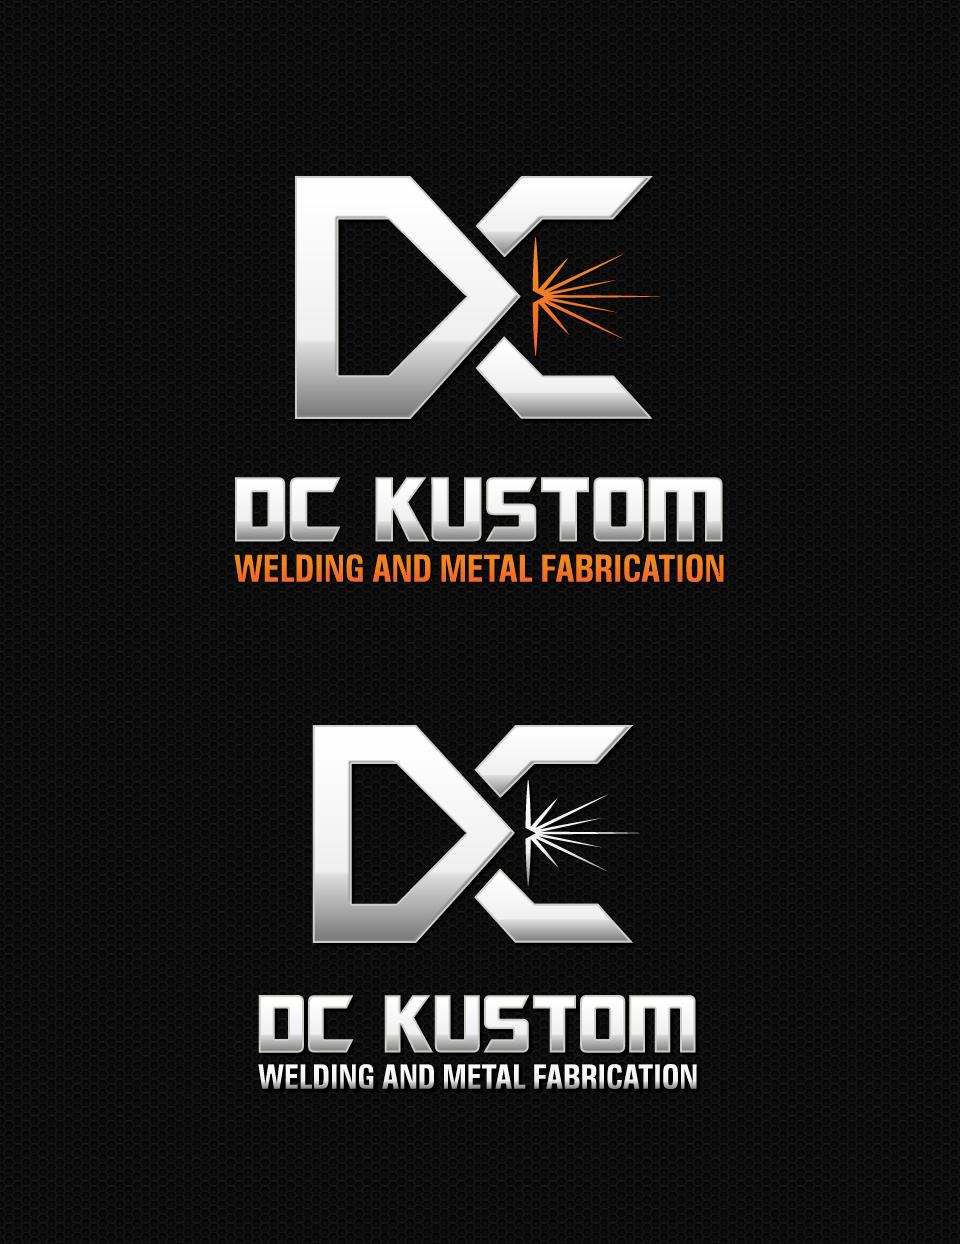 Logo Design by DesignReal - Entry No. 189 in the Logo Design Contest Imaginative Logo Design for DC KUSTOM WELDING & METAL FABRICATION.